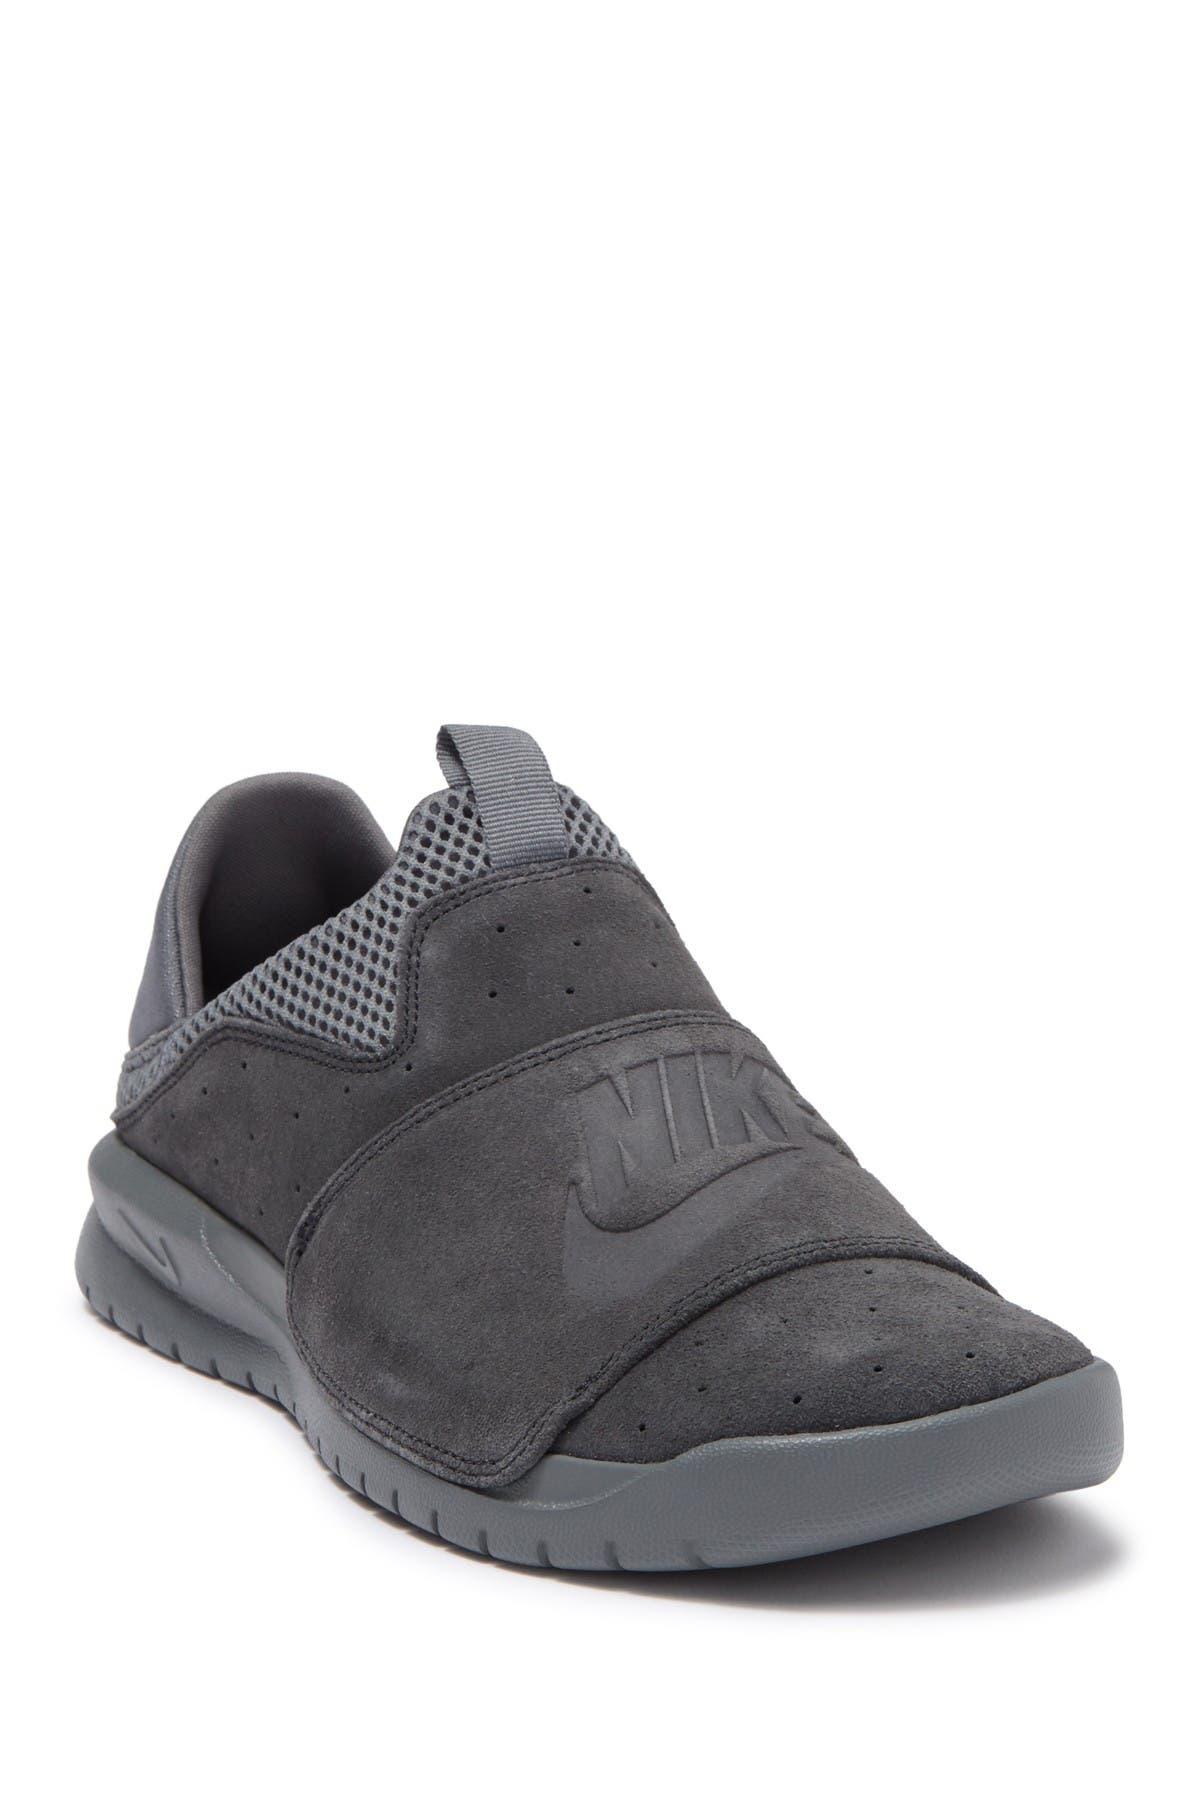 Nike | Benassi Slip-On Sneaker